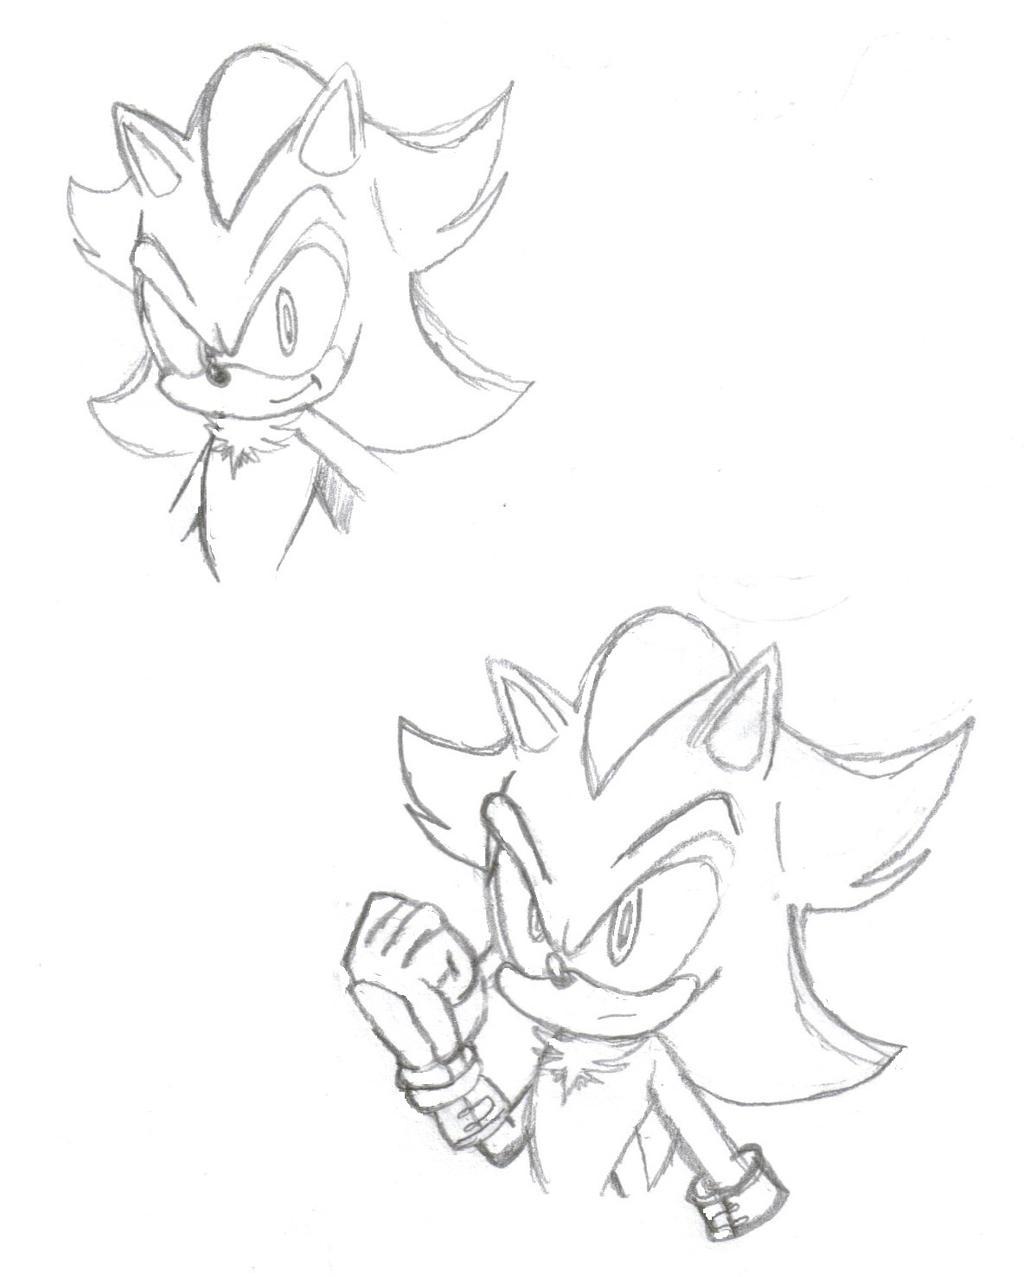 Sonic Boom Shadow sketch by teniuq4444 on DeviantArt